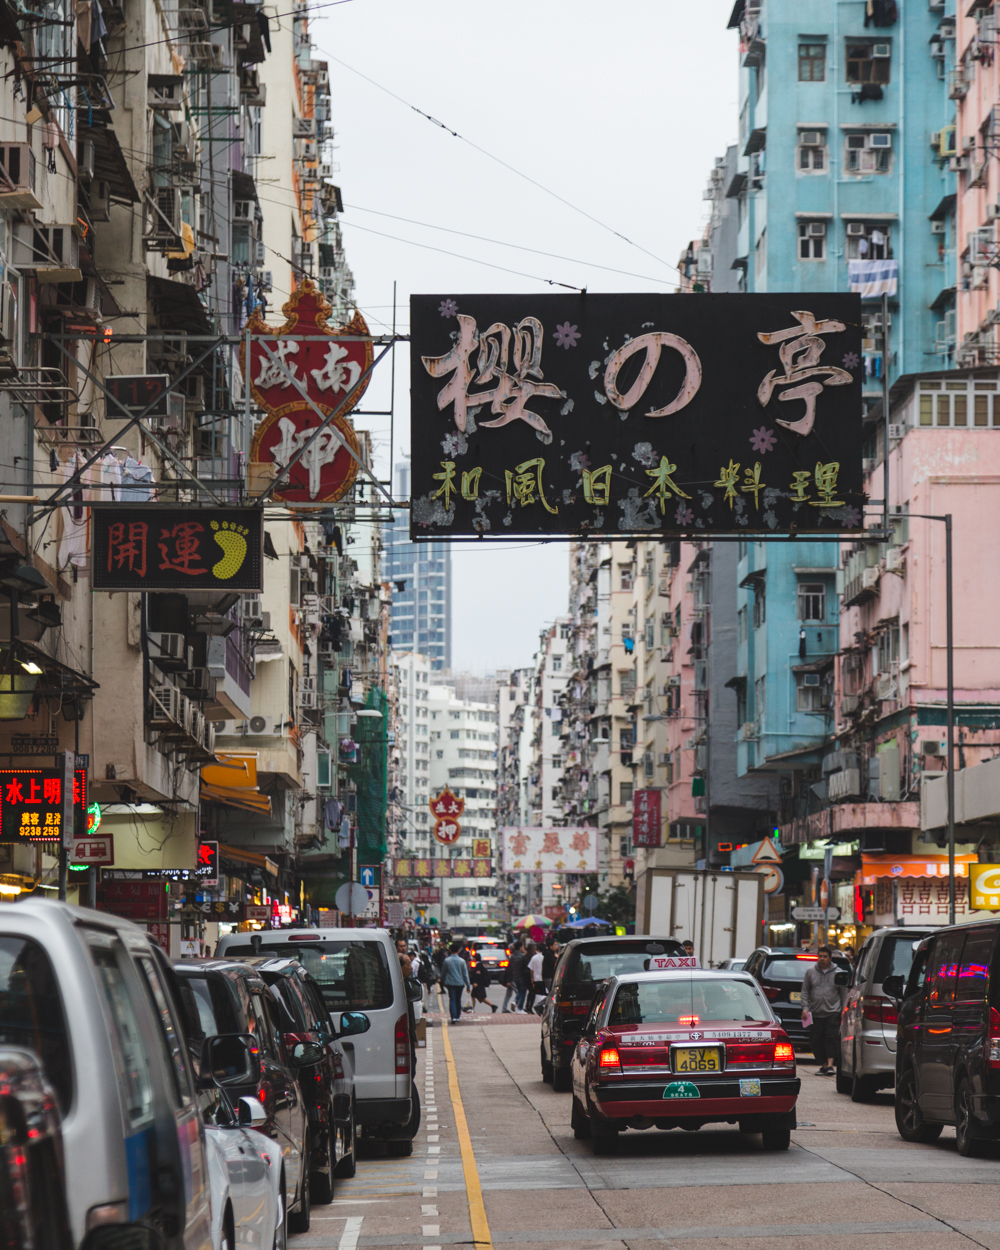 HONG KONG TRAVEL BLOG - ITCHBAN.COM - 022.jpg